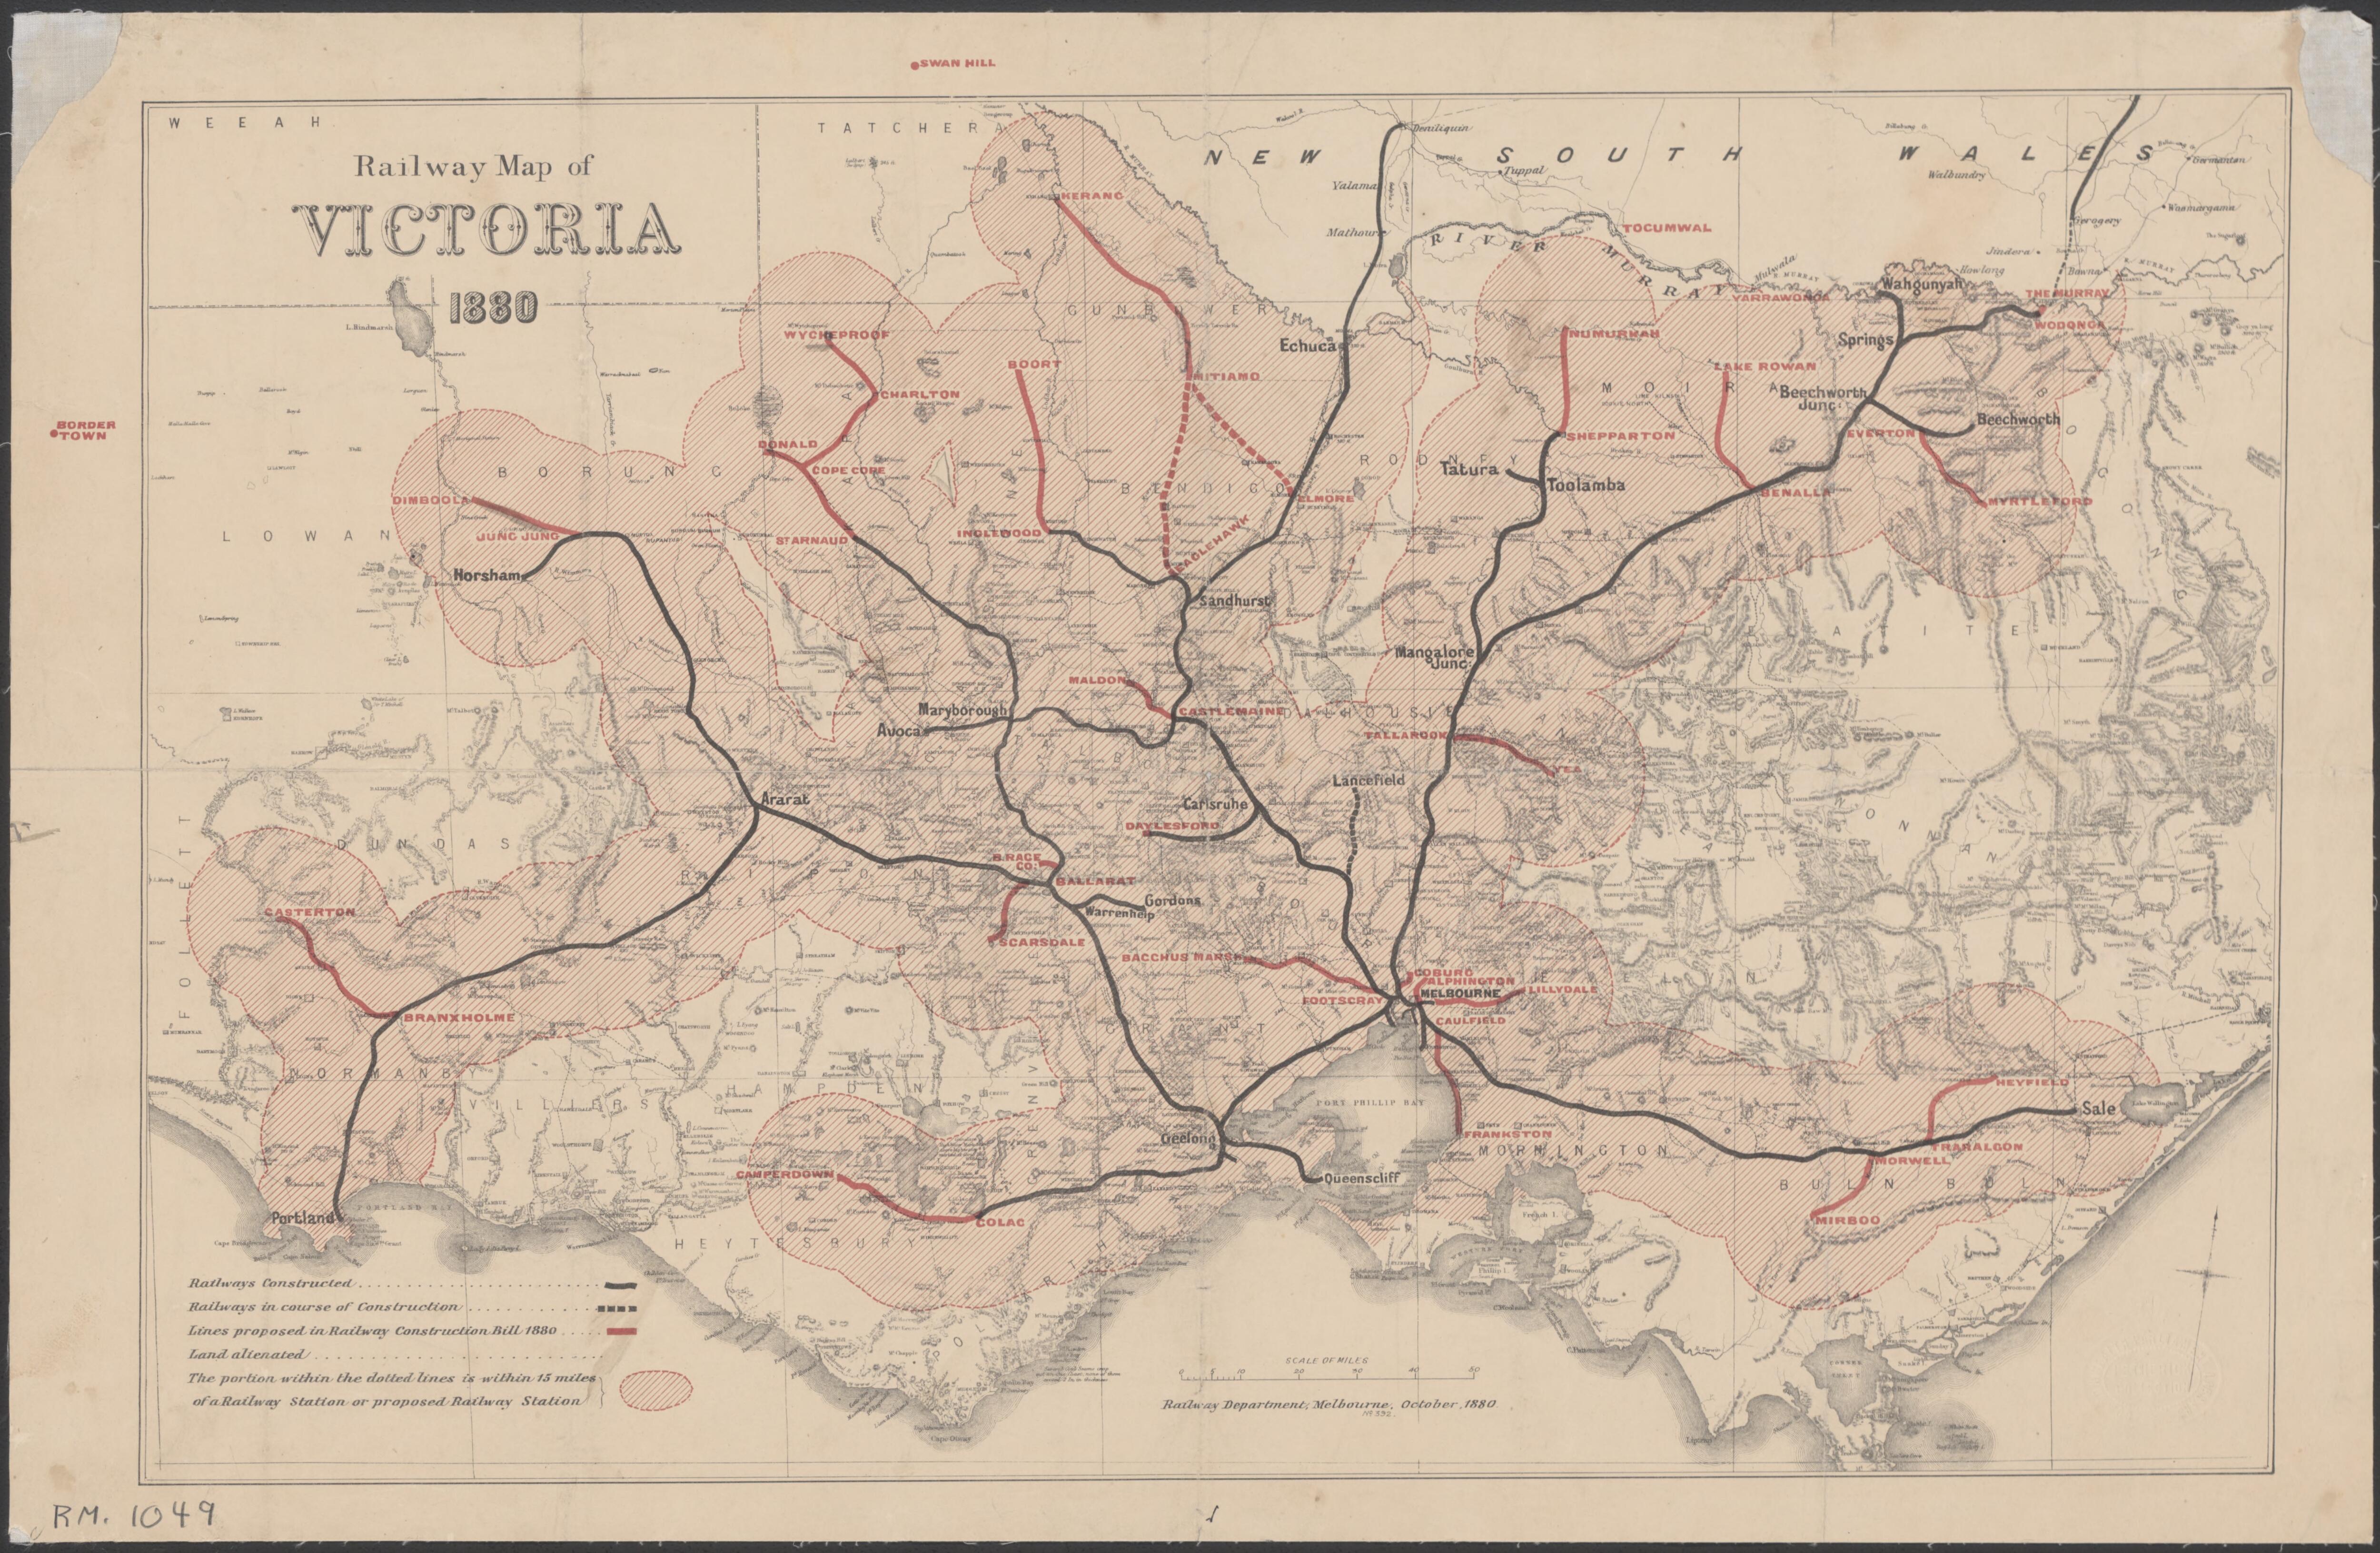 Evolution of rail maps in Victoria | Maps by Philip Mallis